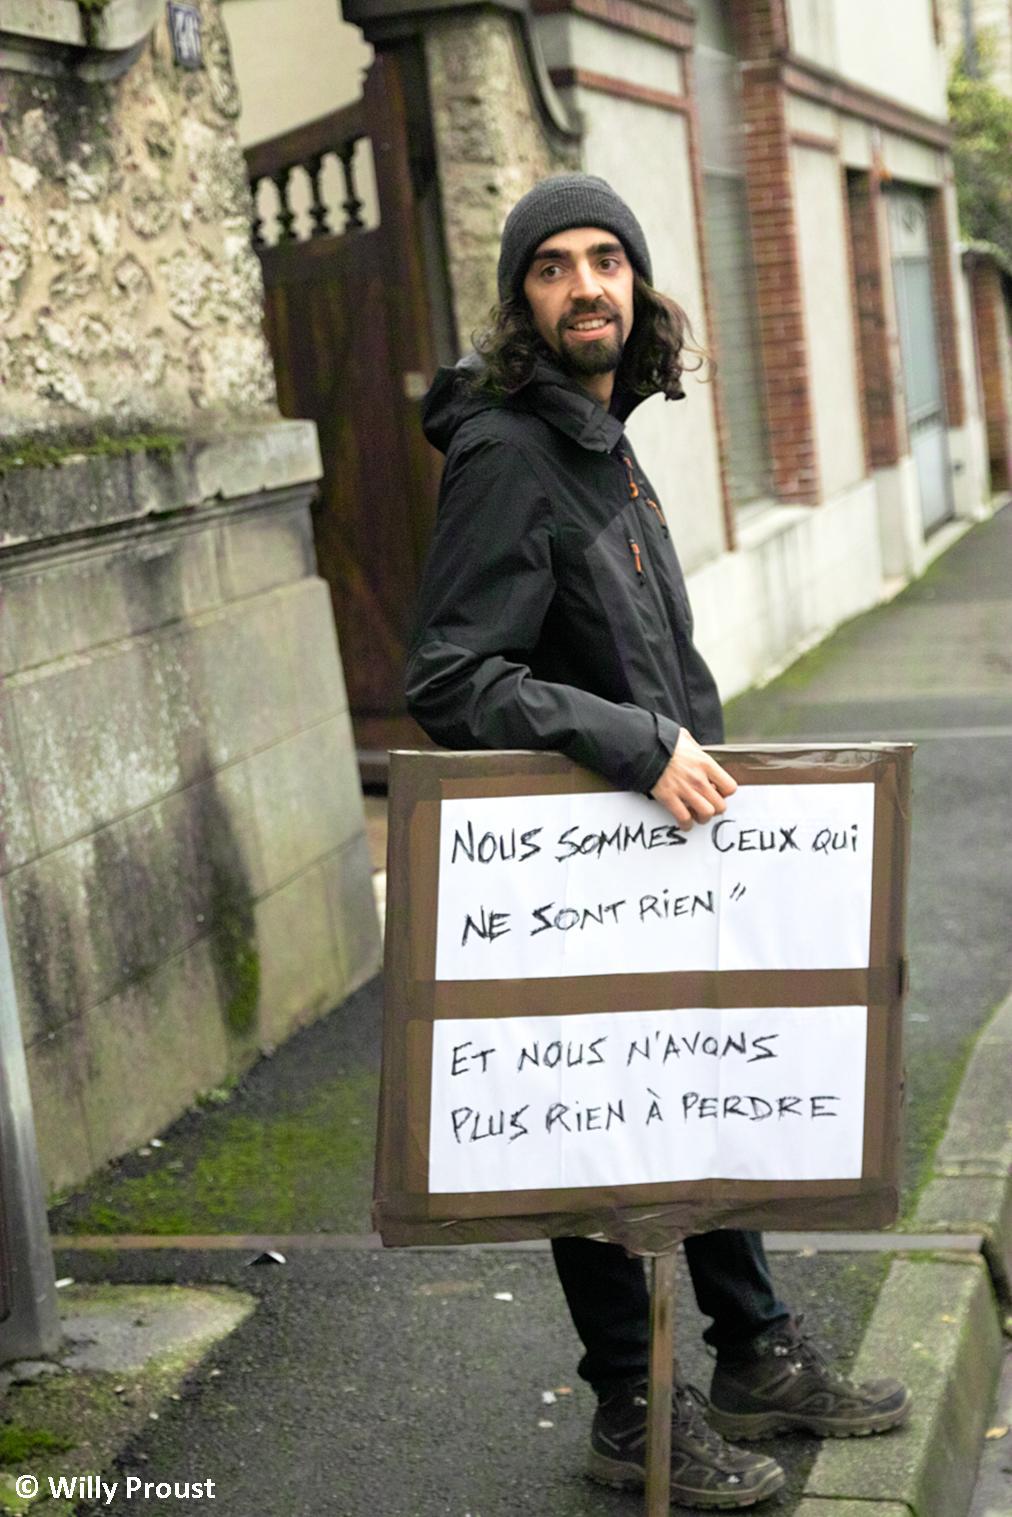 Chartres 17-12-2019 Manifestation Retraites [Photo Willy Proust] 14